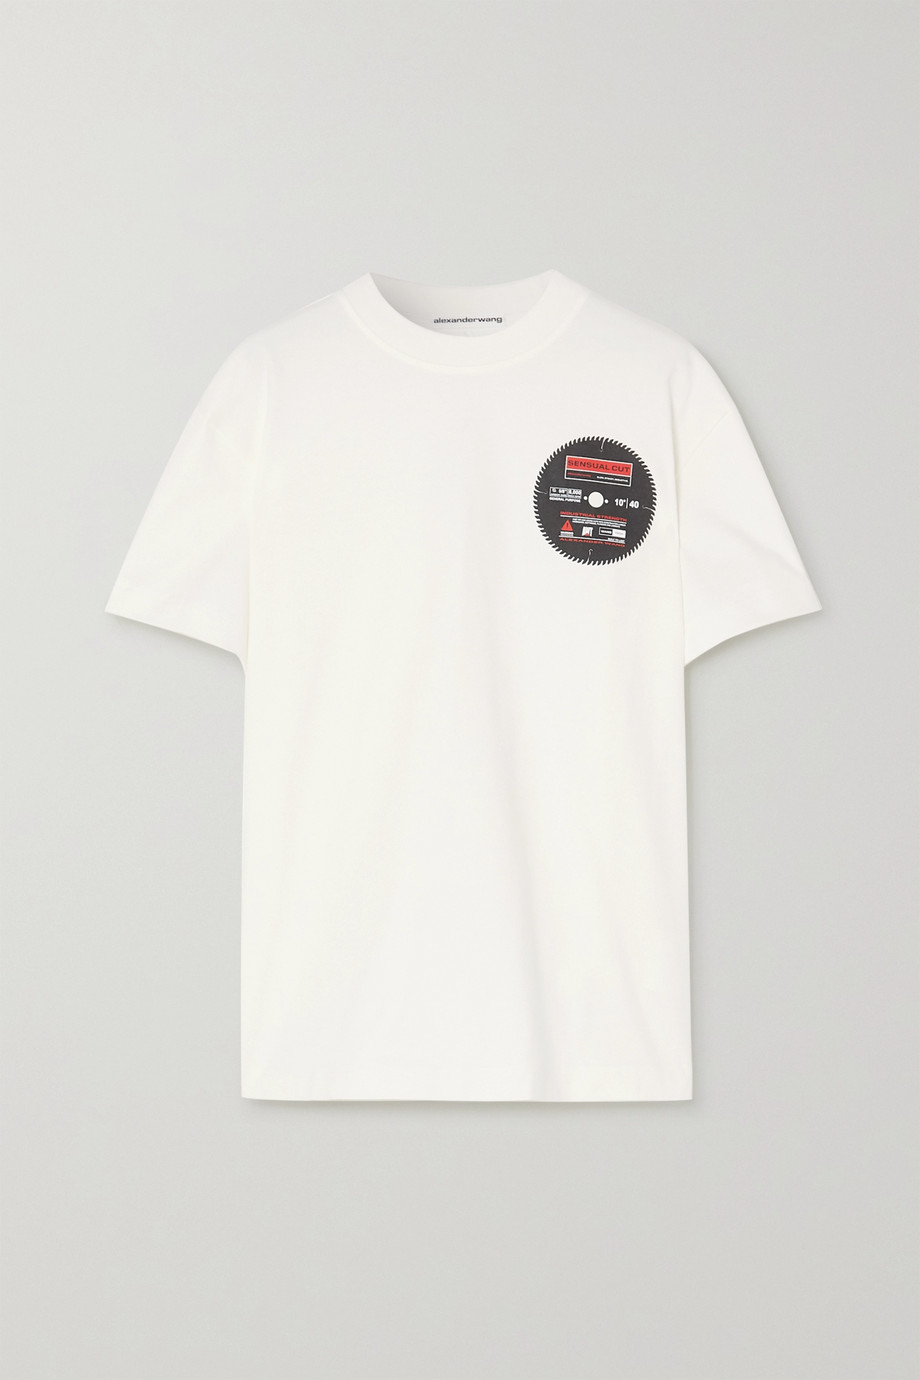 Alexander Wang T-shirt en jersey de coton imprimé